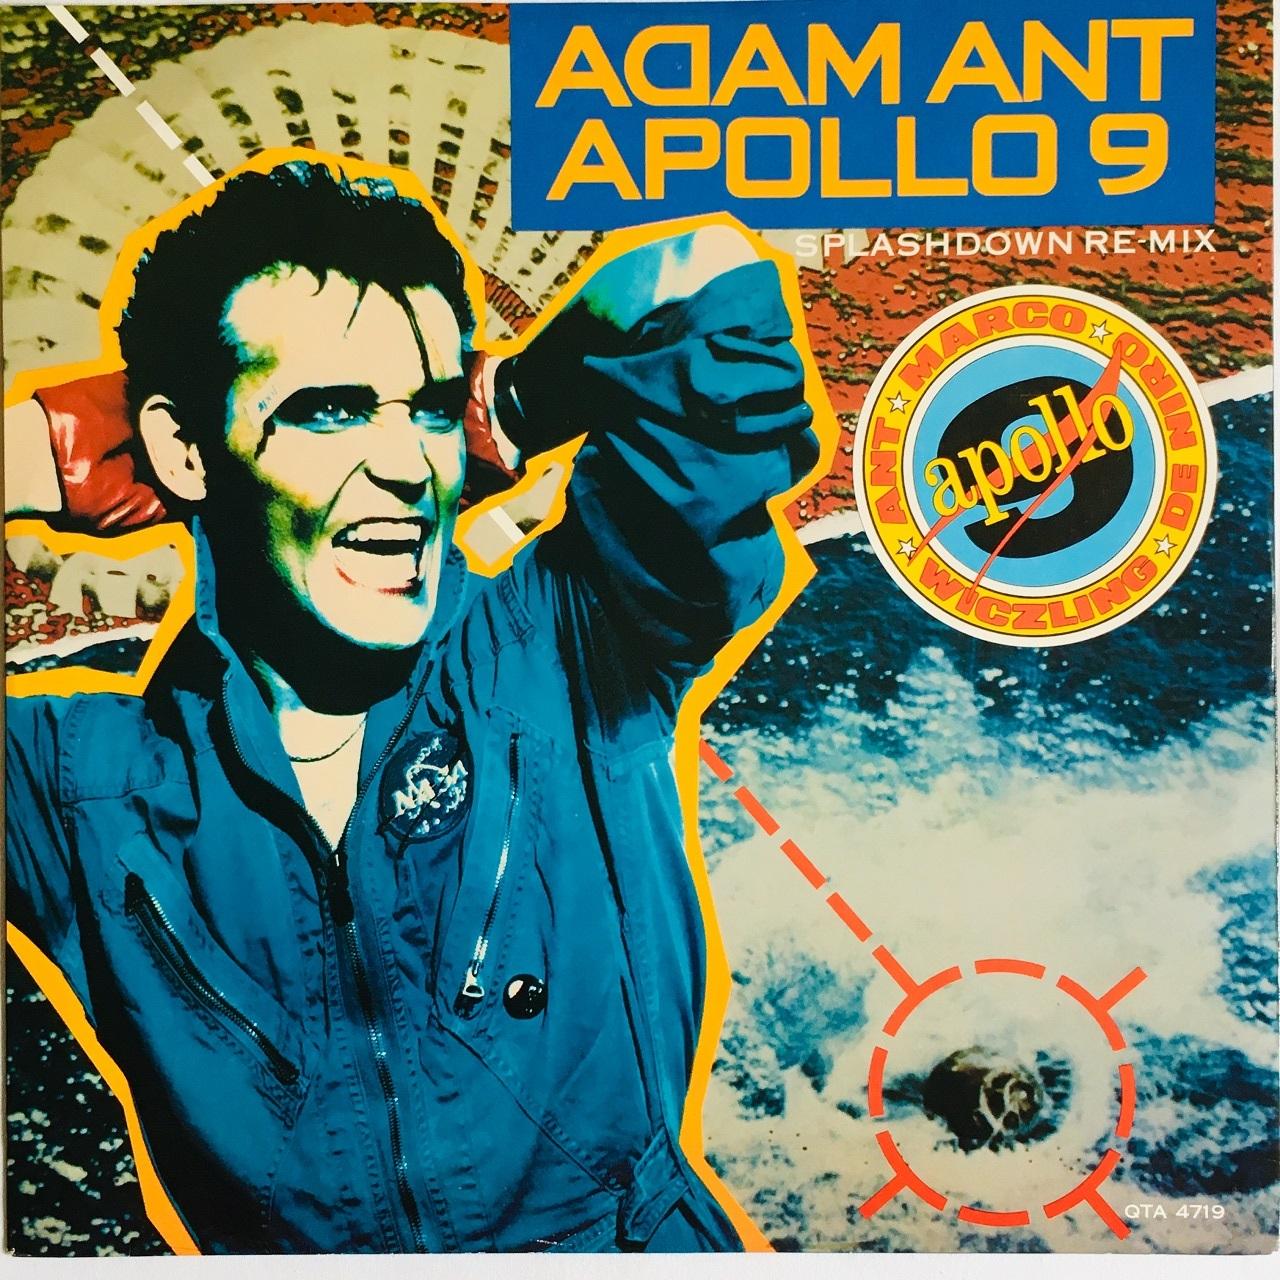 【12inch・英盤】Adam Ant / Apollo 9 (Splashdown Re-Mix)